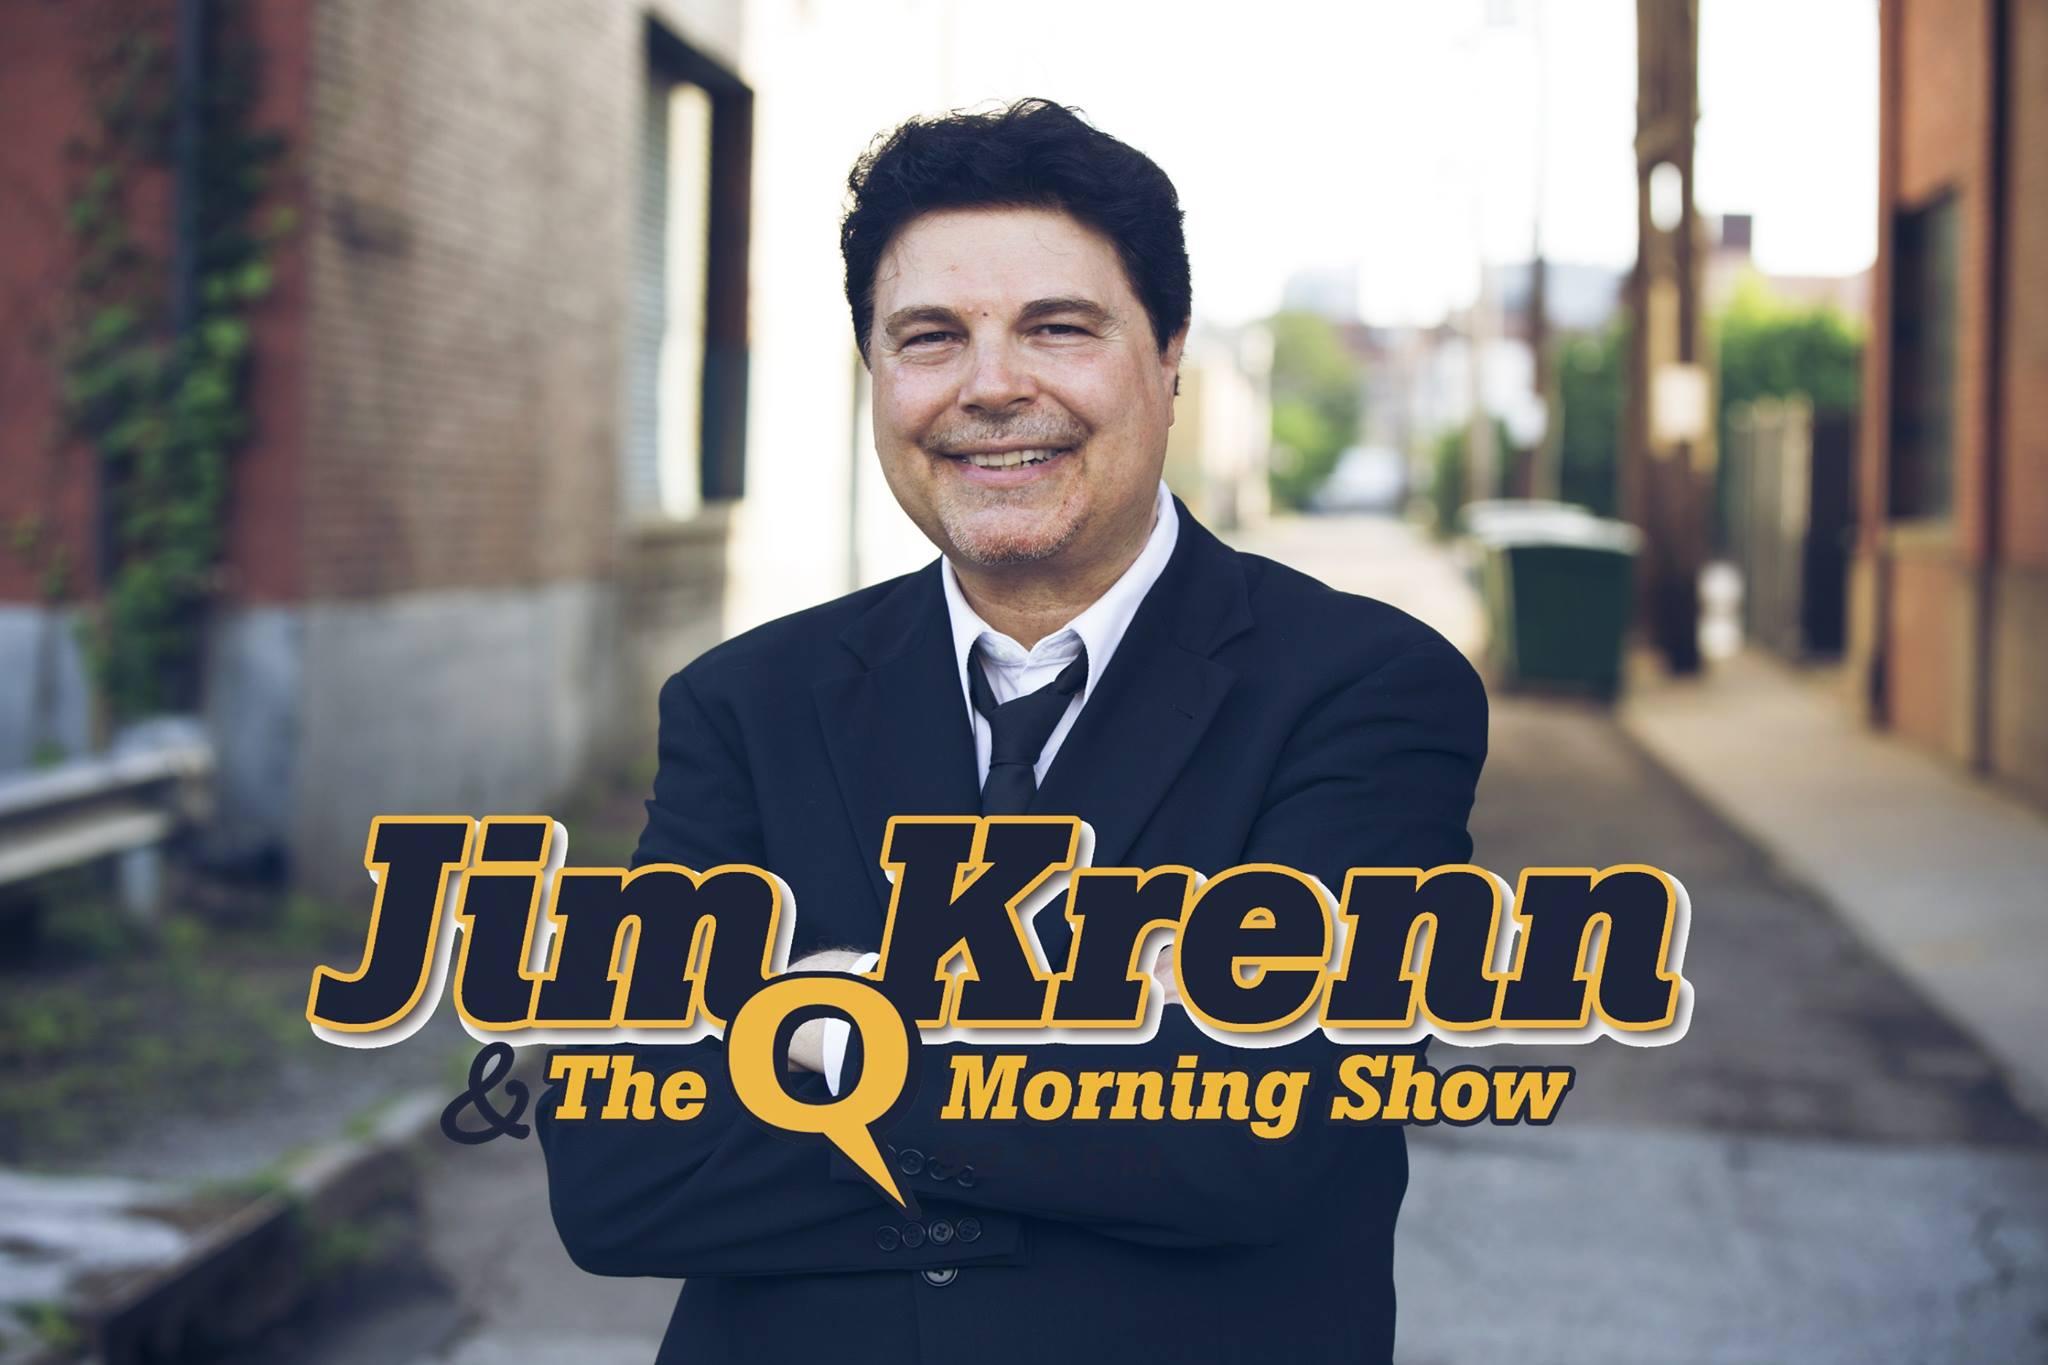 Jim Krenn & The Q Morning Show, Q92.9FM